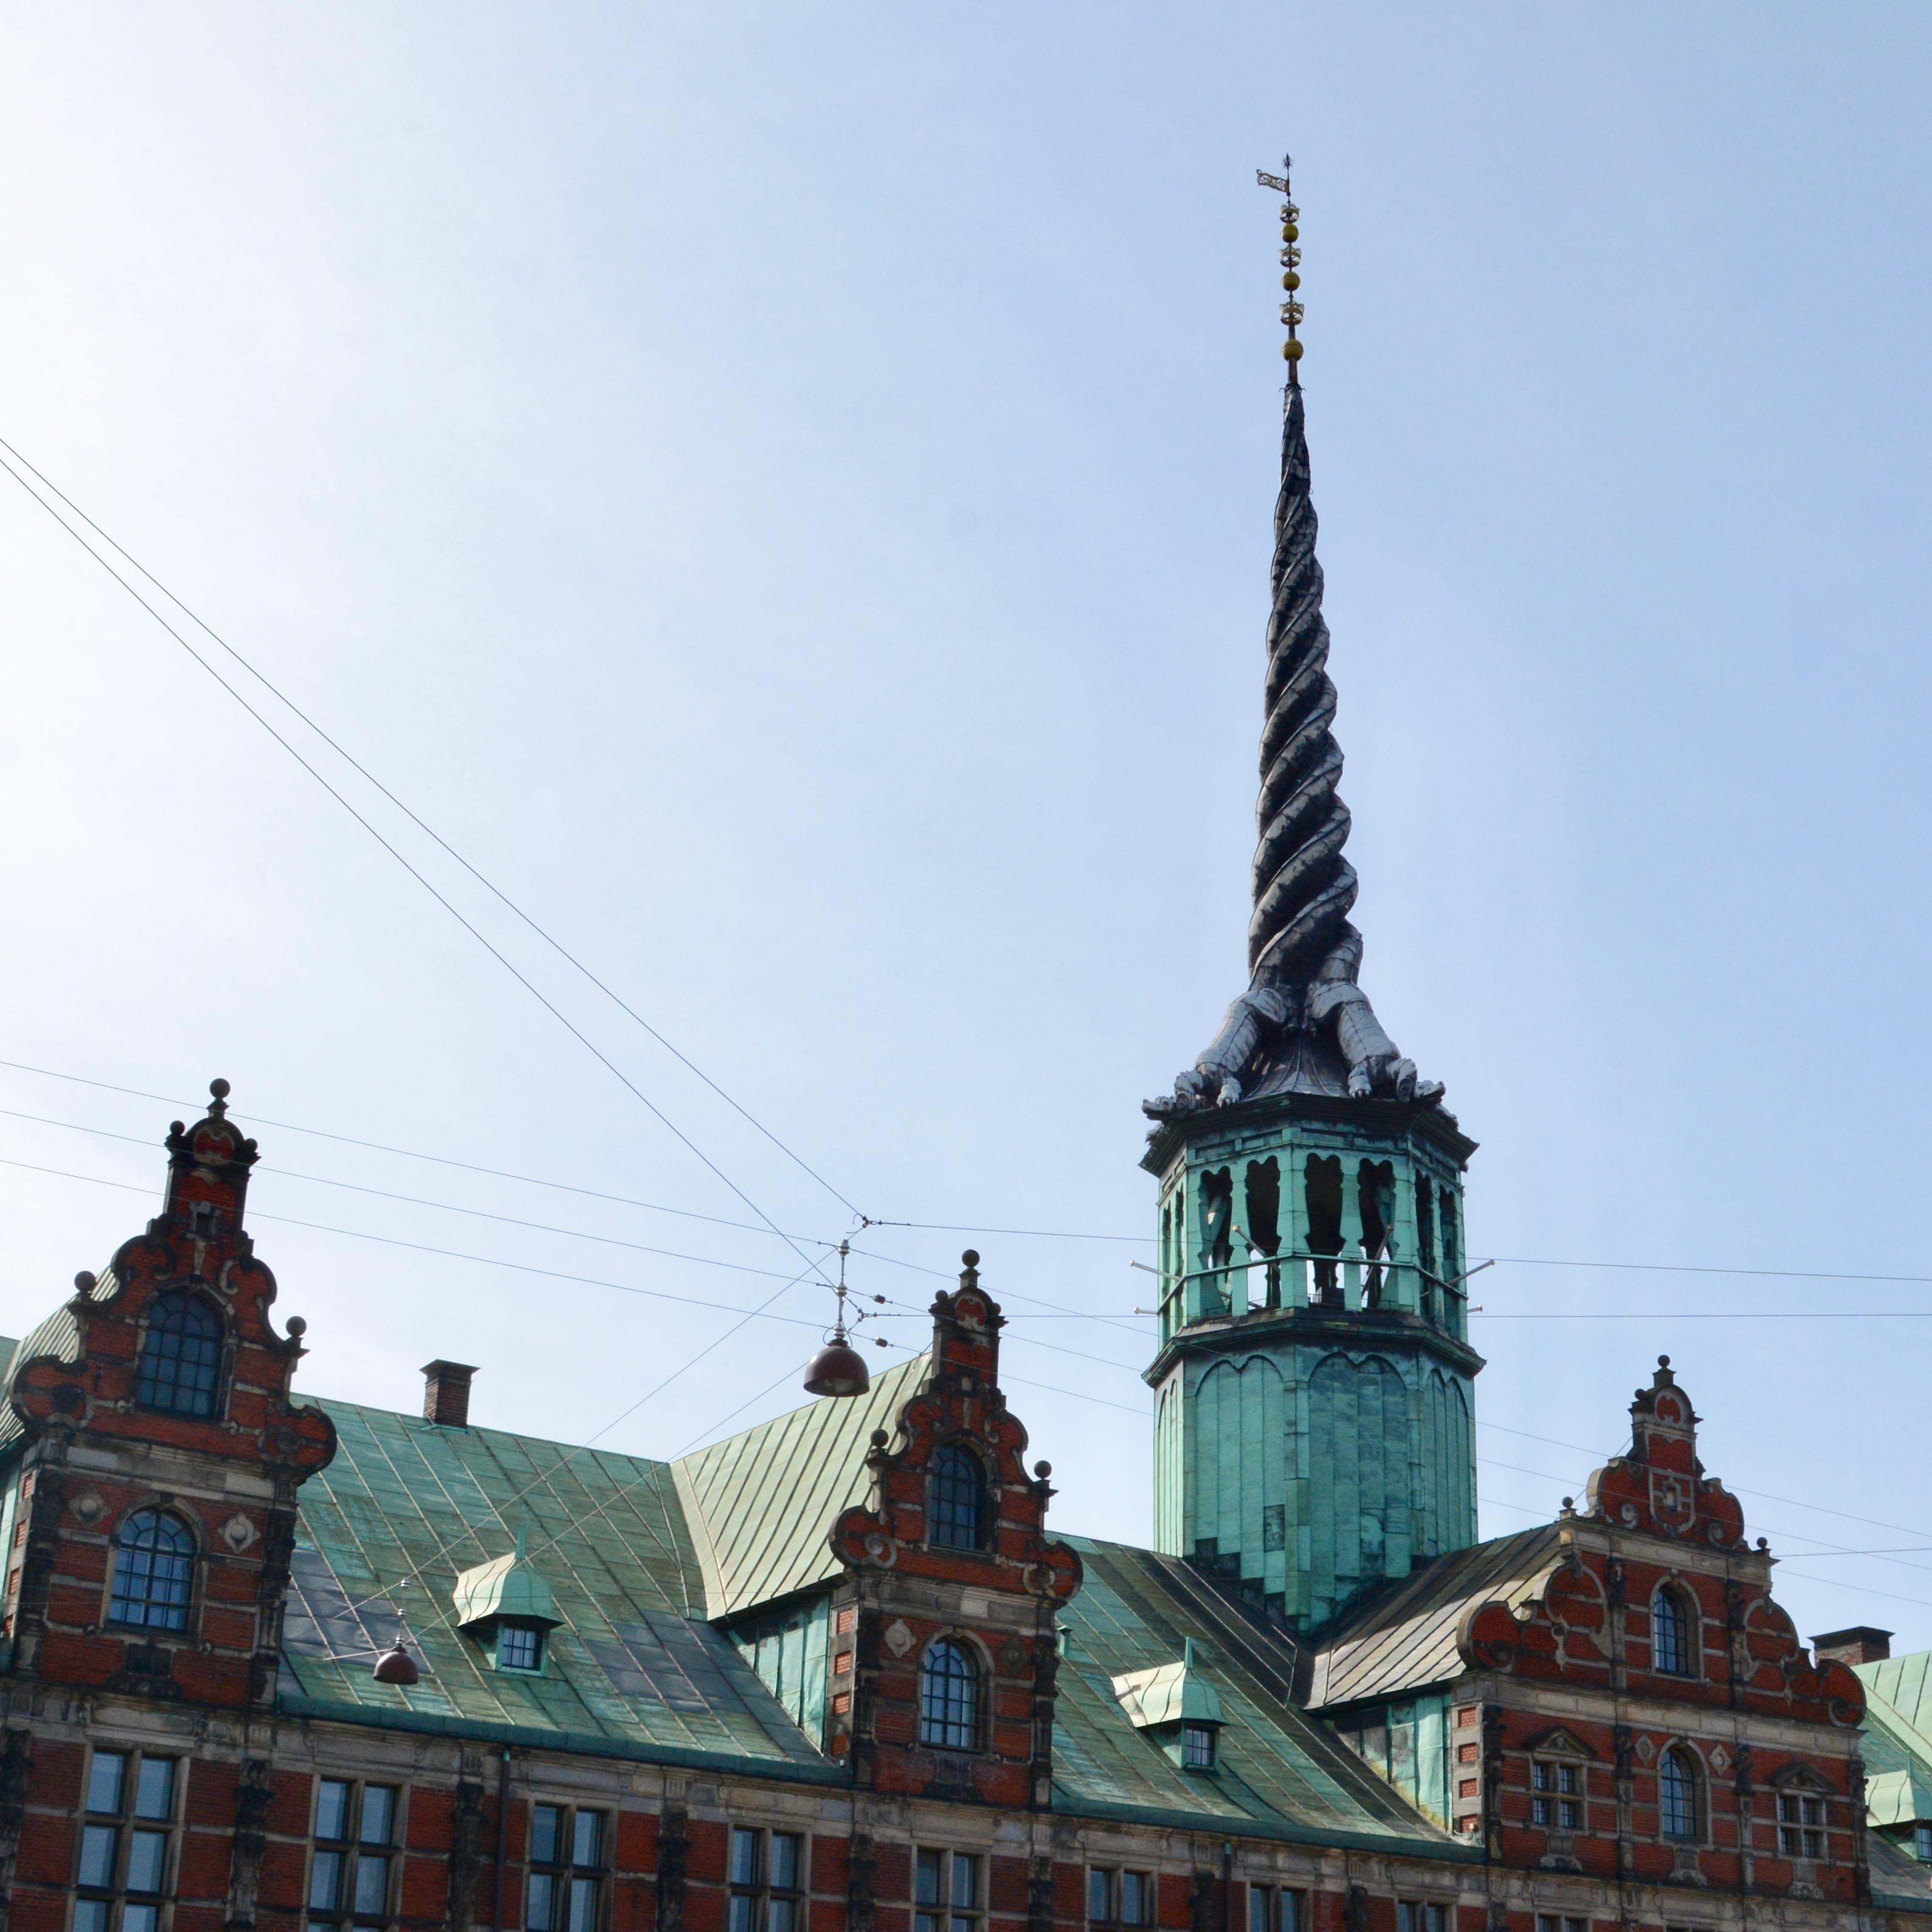 travel with kids children Copenhagen Denmark stock exchange dragon spire